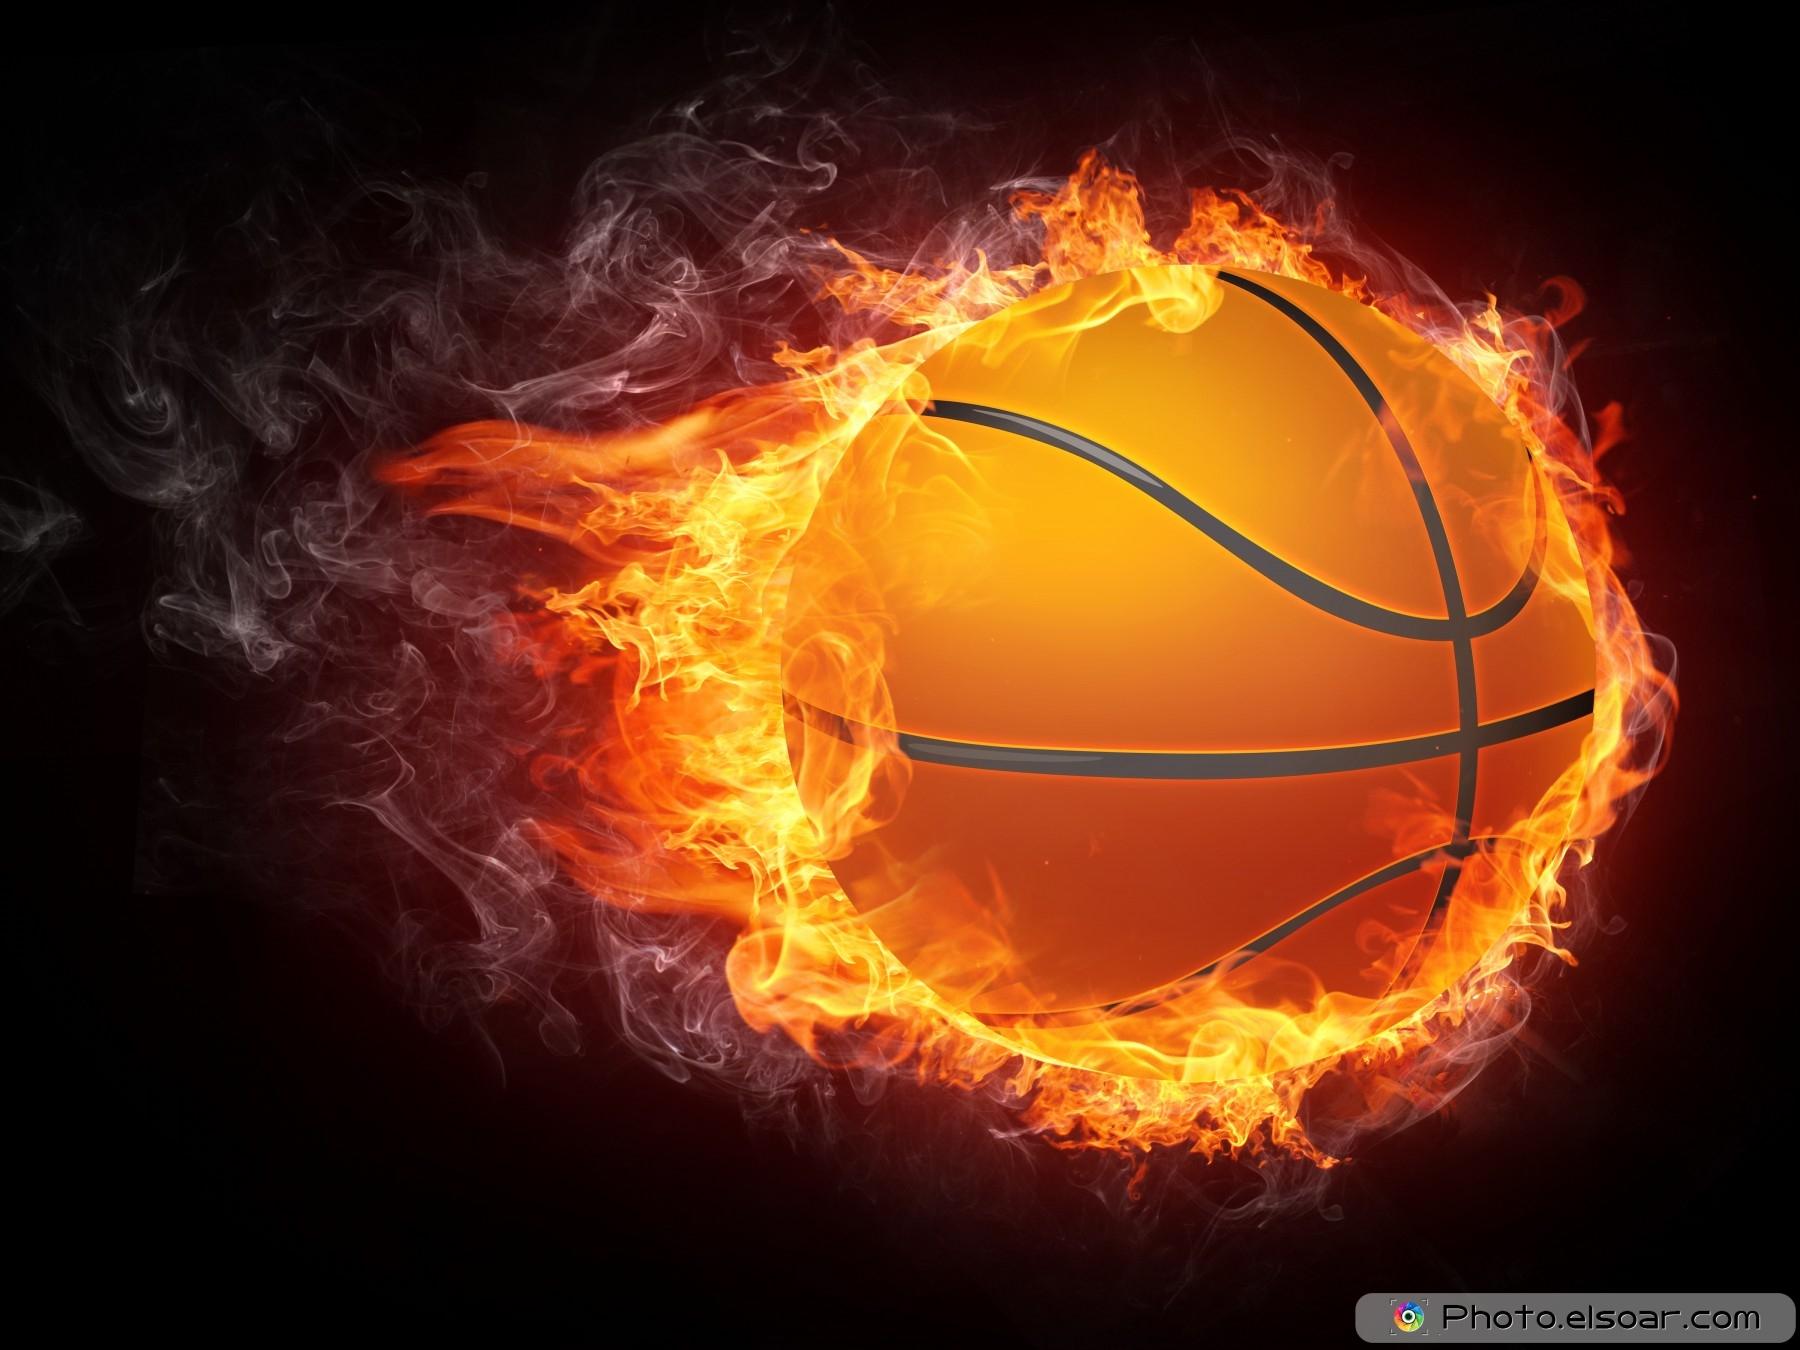 t20a7c6_Basketball-Ball-on-Fire